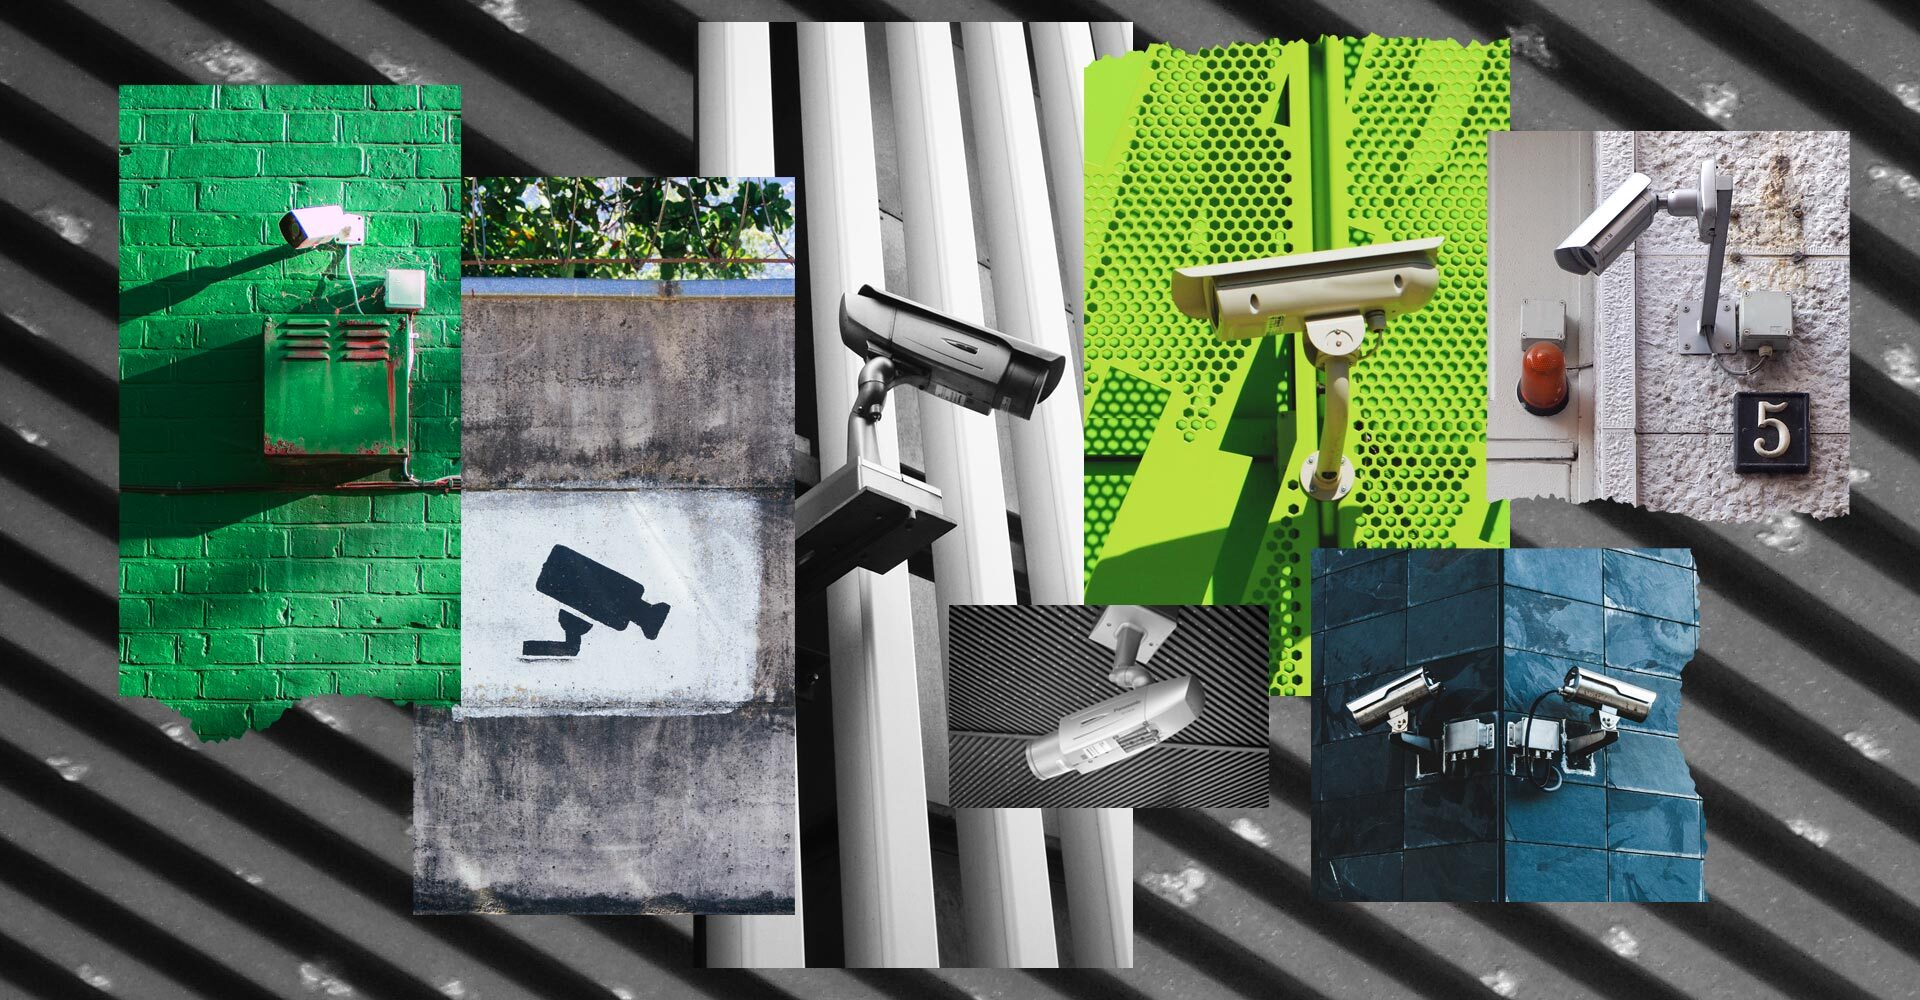 [Image: WDTIKAM_security-cameras.jpg]